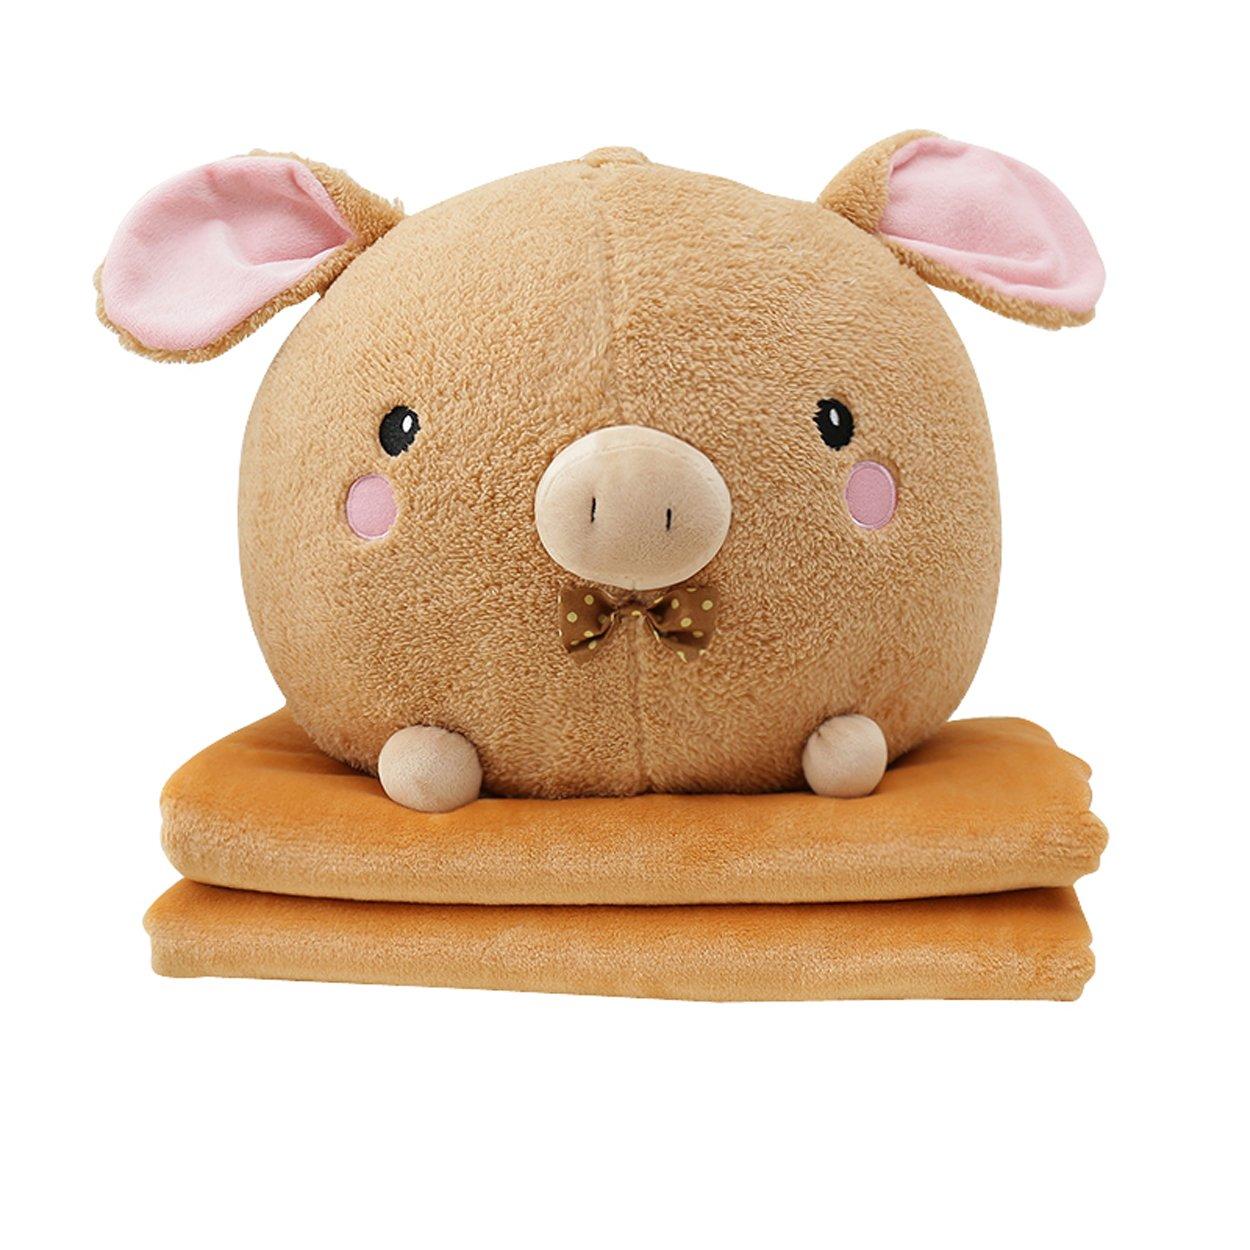 Lovely Cartoon Stuffed Animal Toys Super Soft Warm Comforter Travel Blanket Plush Throw Pillow Folded Fleece Blankets Quilt Set 2 in 1 (39'' X 59'', Light Brown Pig)